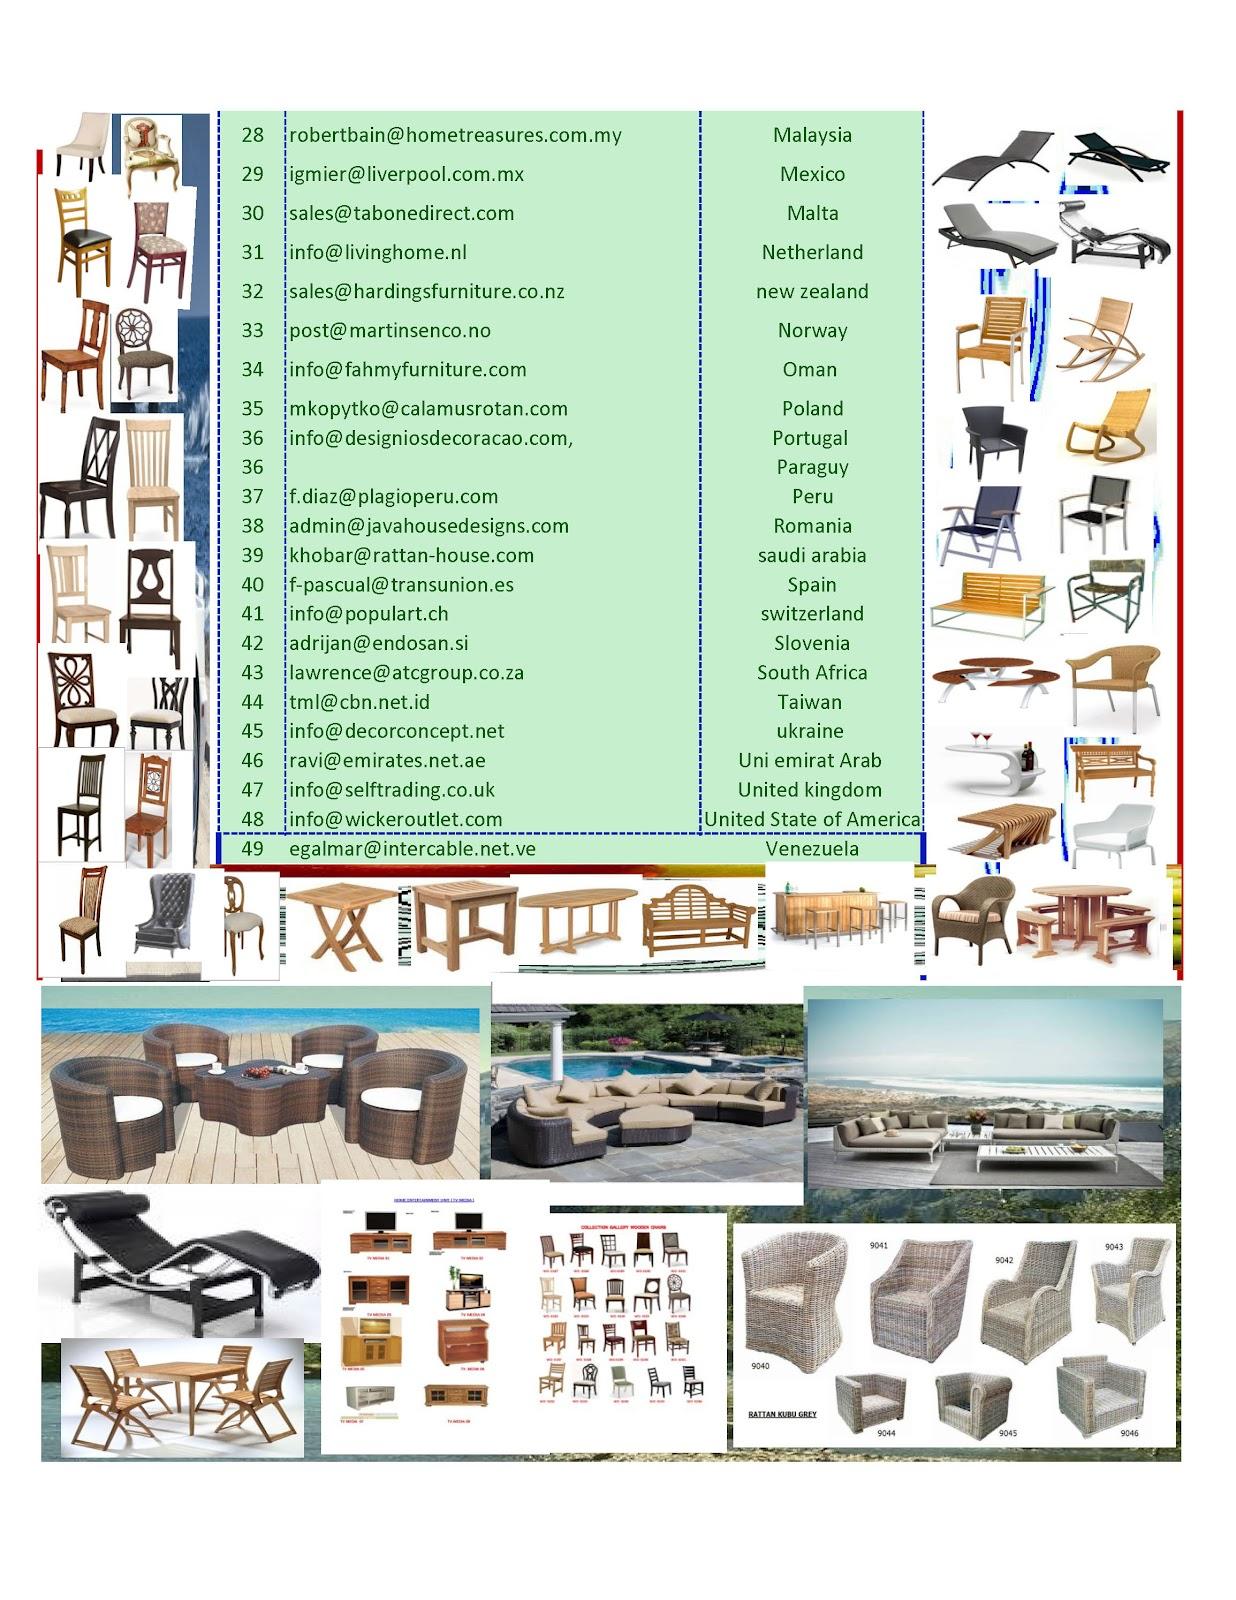 furniture list globalfurniturebuyer list furniture buyer